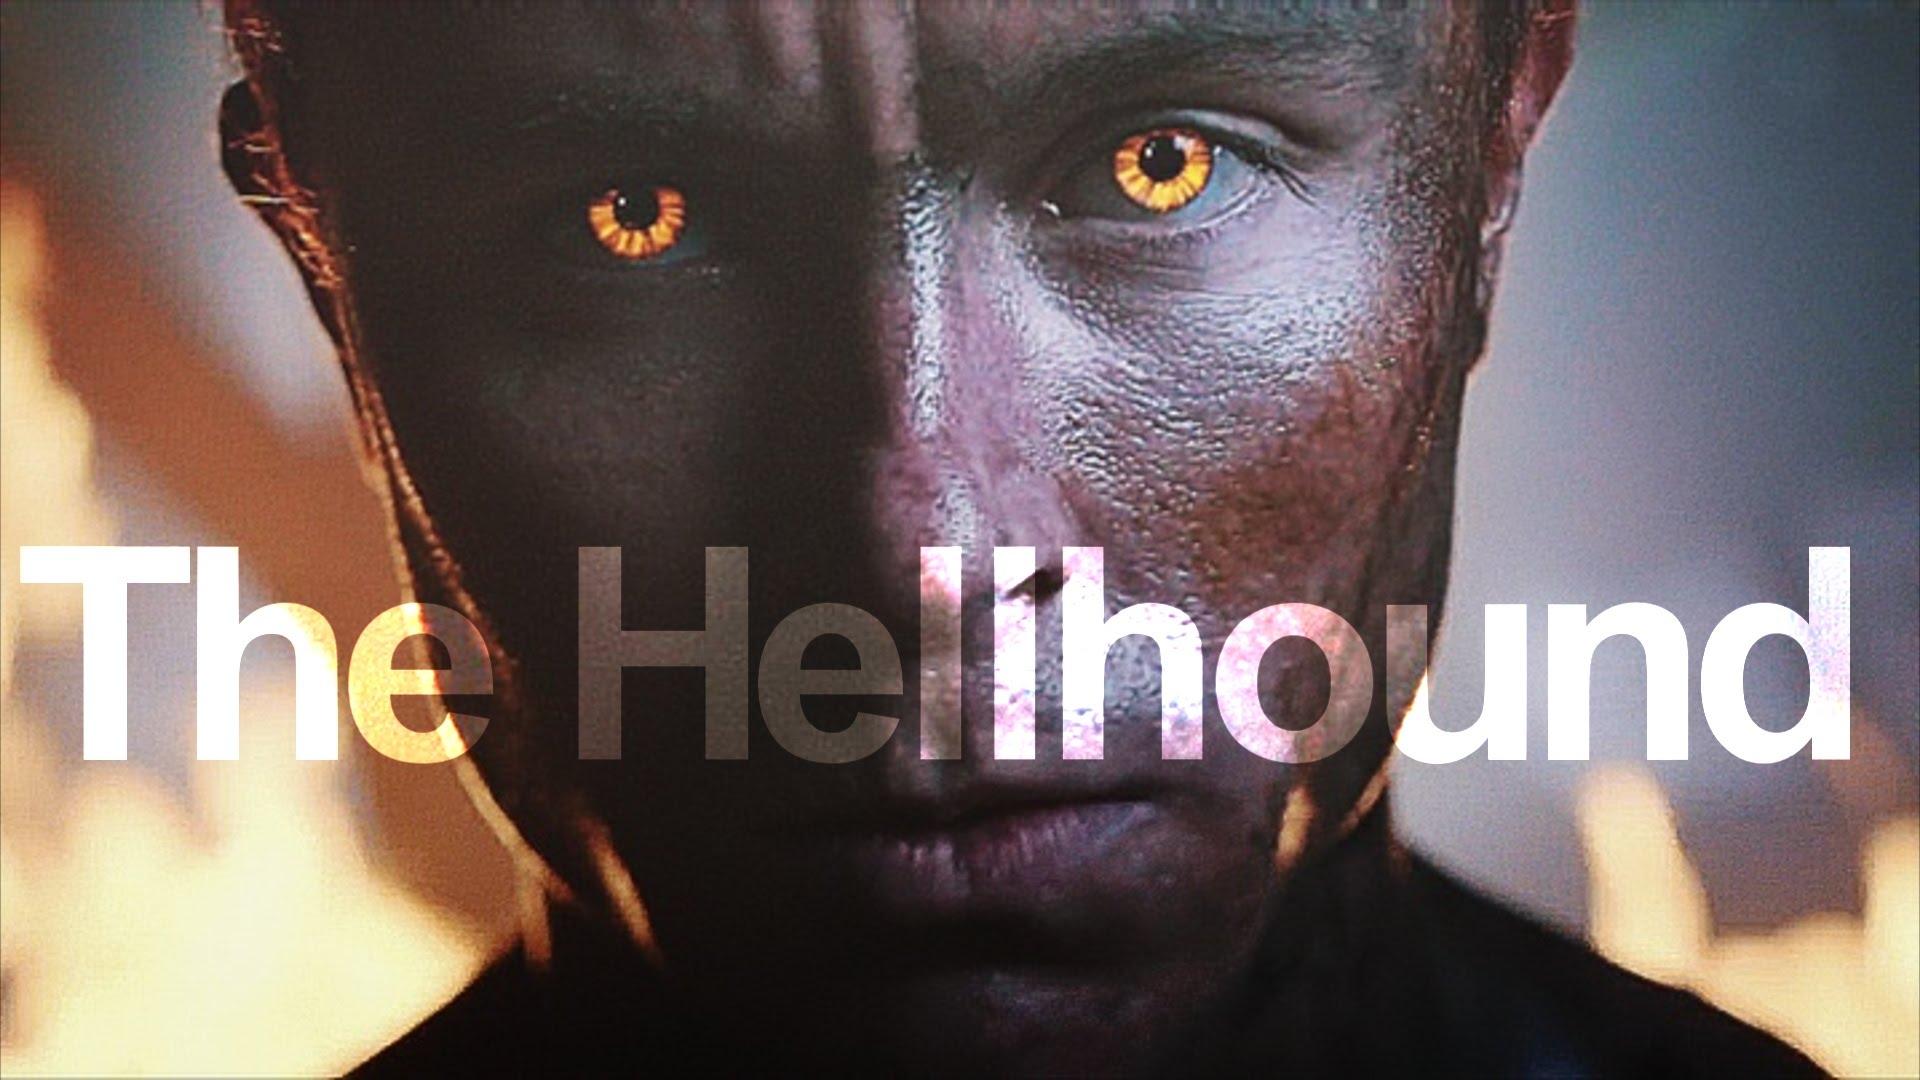 Hellhounds | Teen Wolf Universe Wikia | FANDOM powered by Wikia